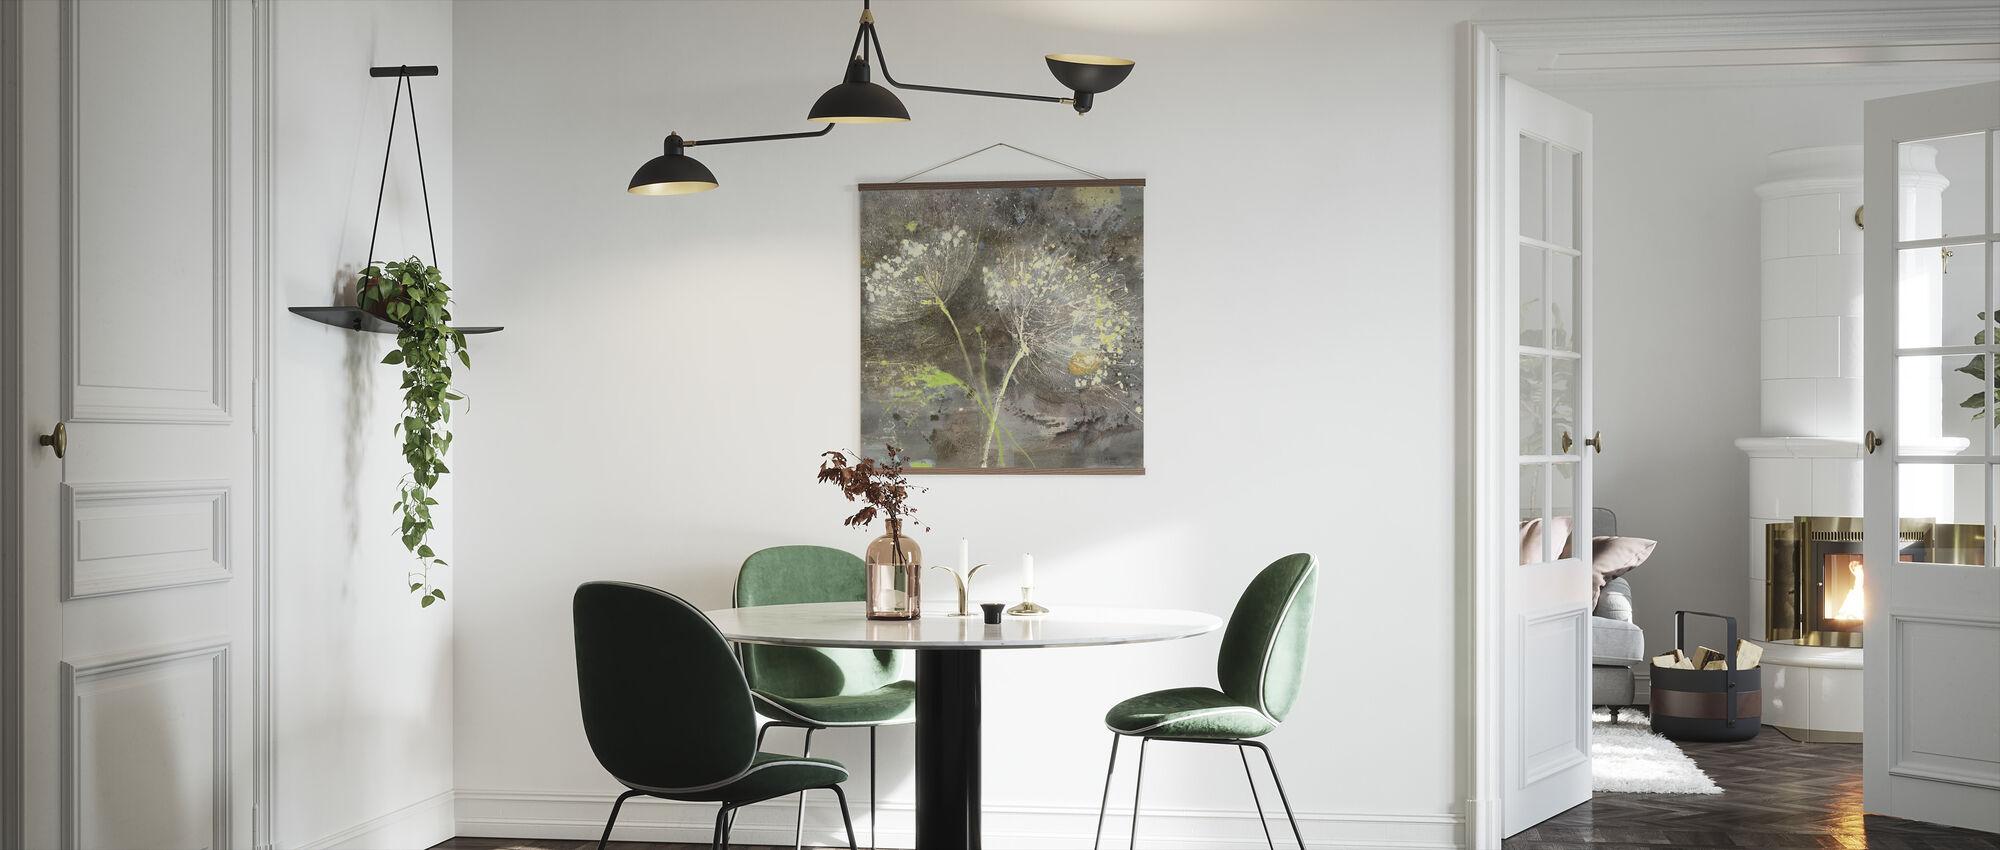 Sparklers 3 - Poster - Keuken